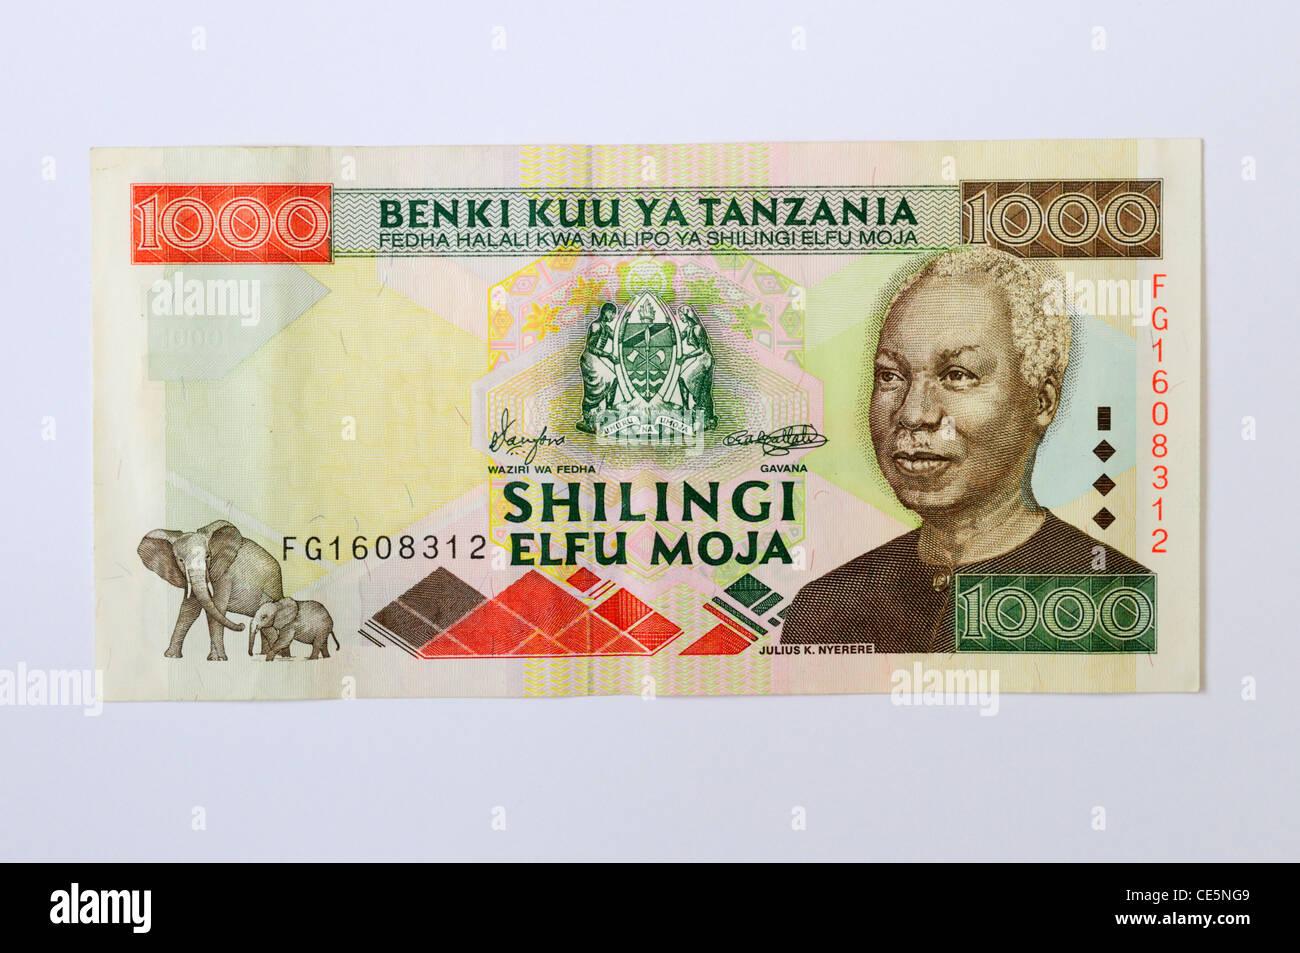 1000 Tanzanian Shilling Banknote - Stock Image